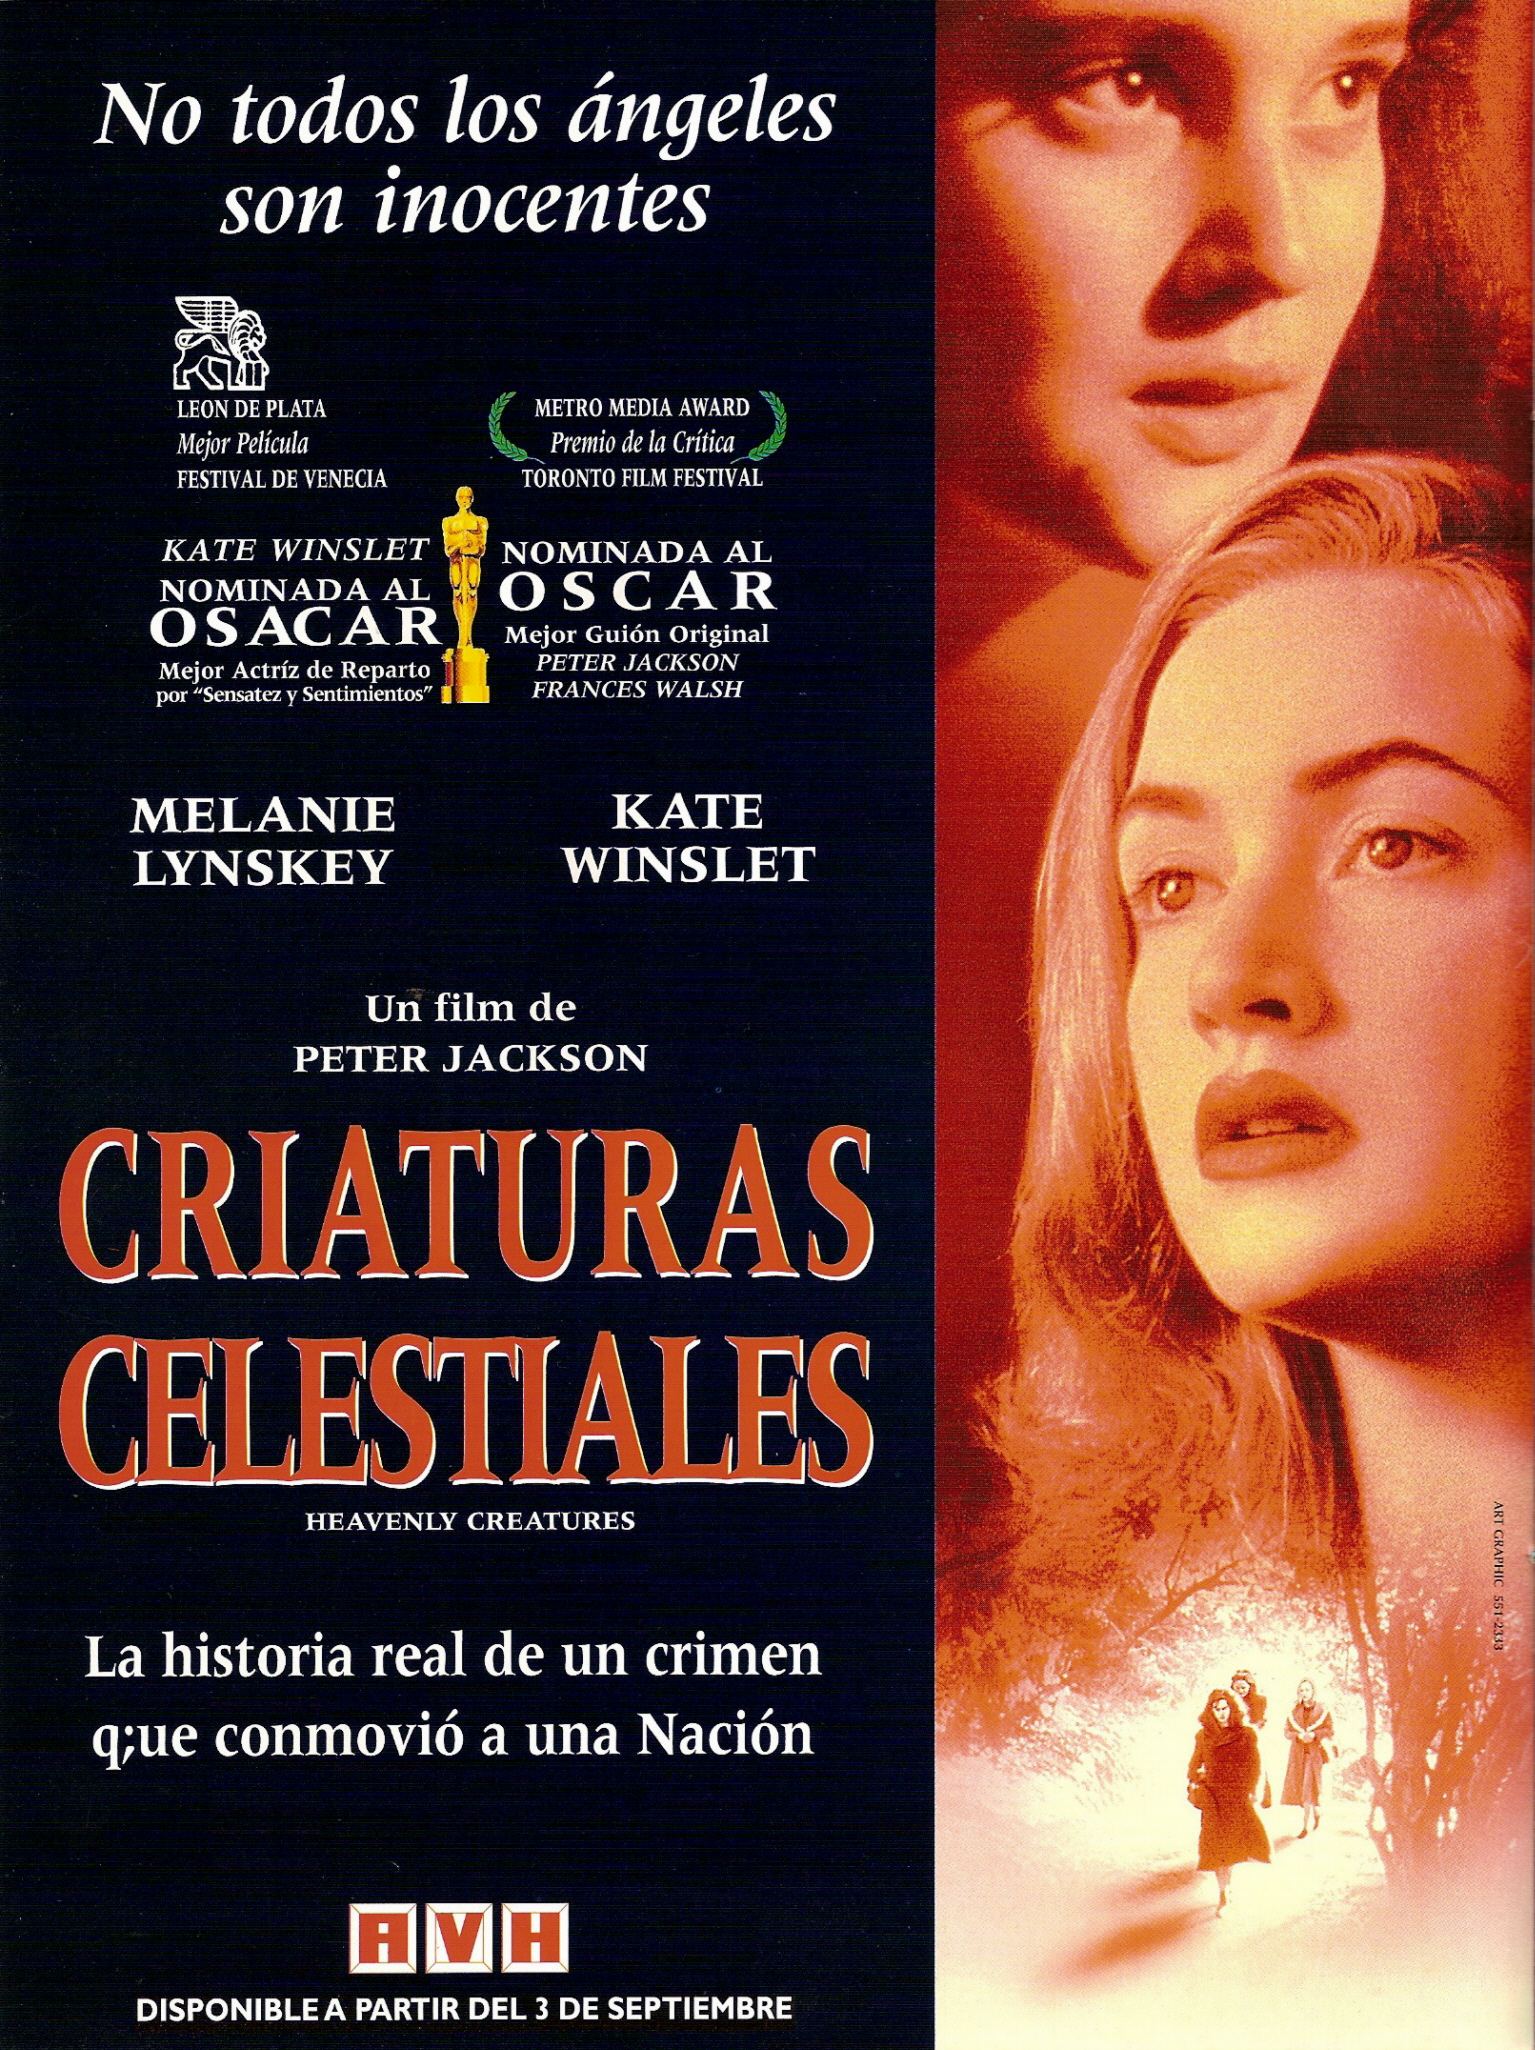 Kate Winslet and Melanie Lynskey in Heavenly Creatures (1994)